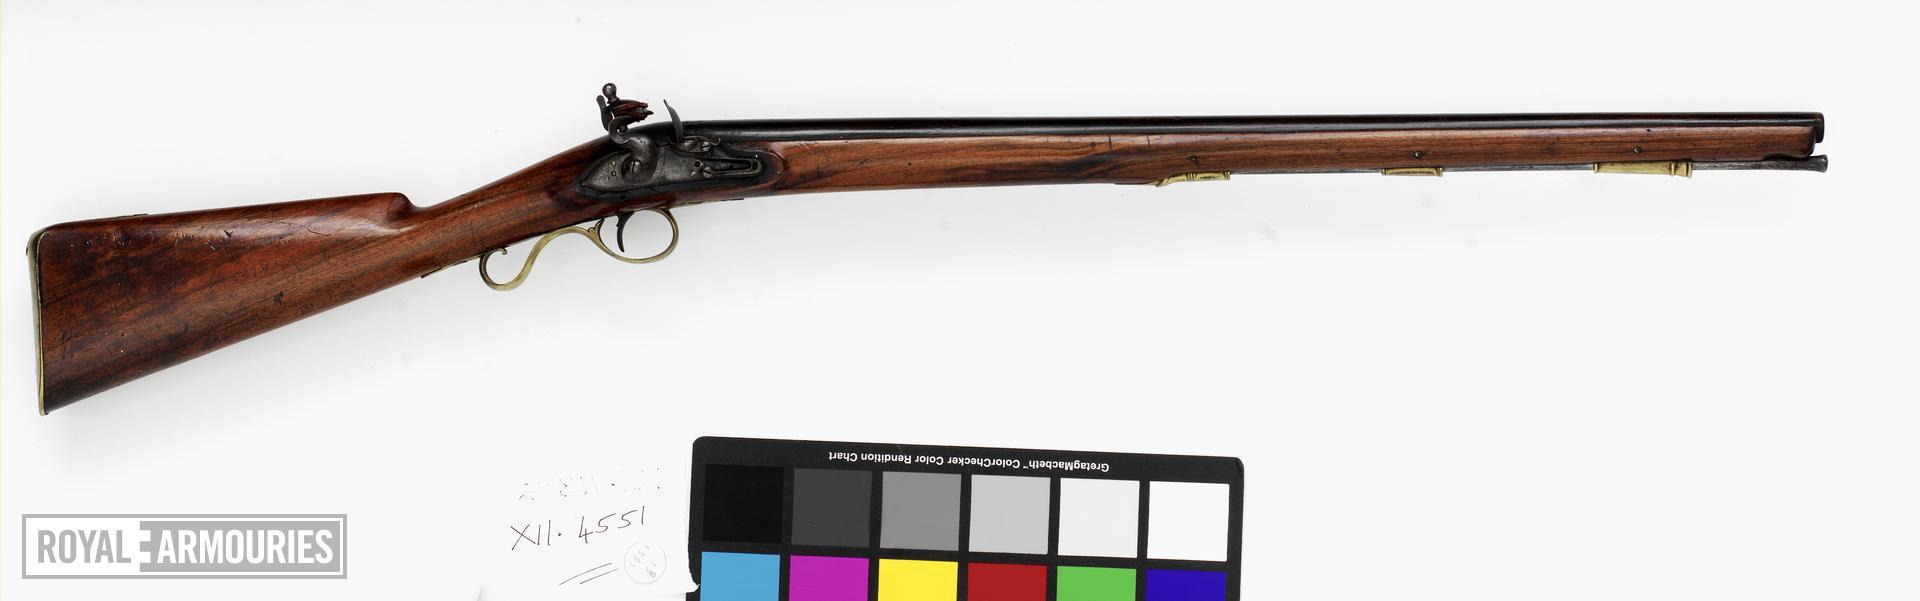 Flintlock gun - By J. Collins